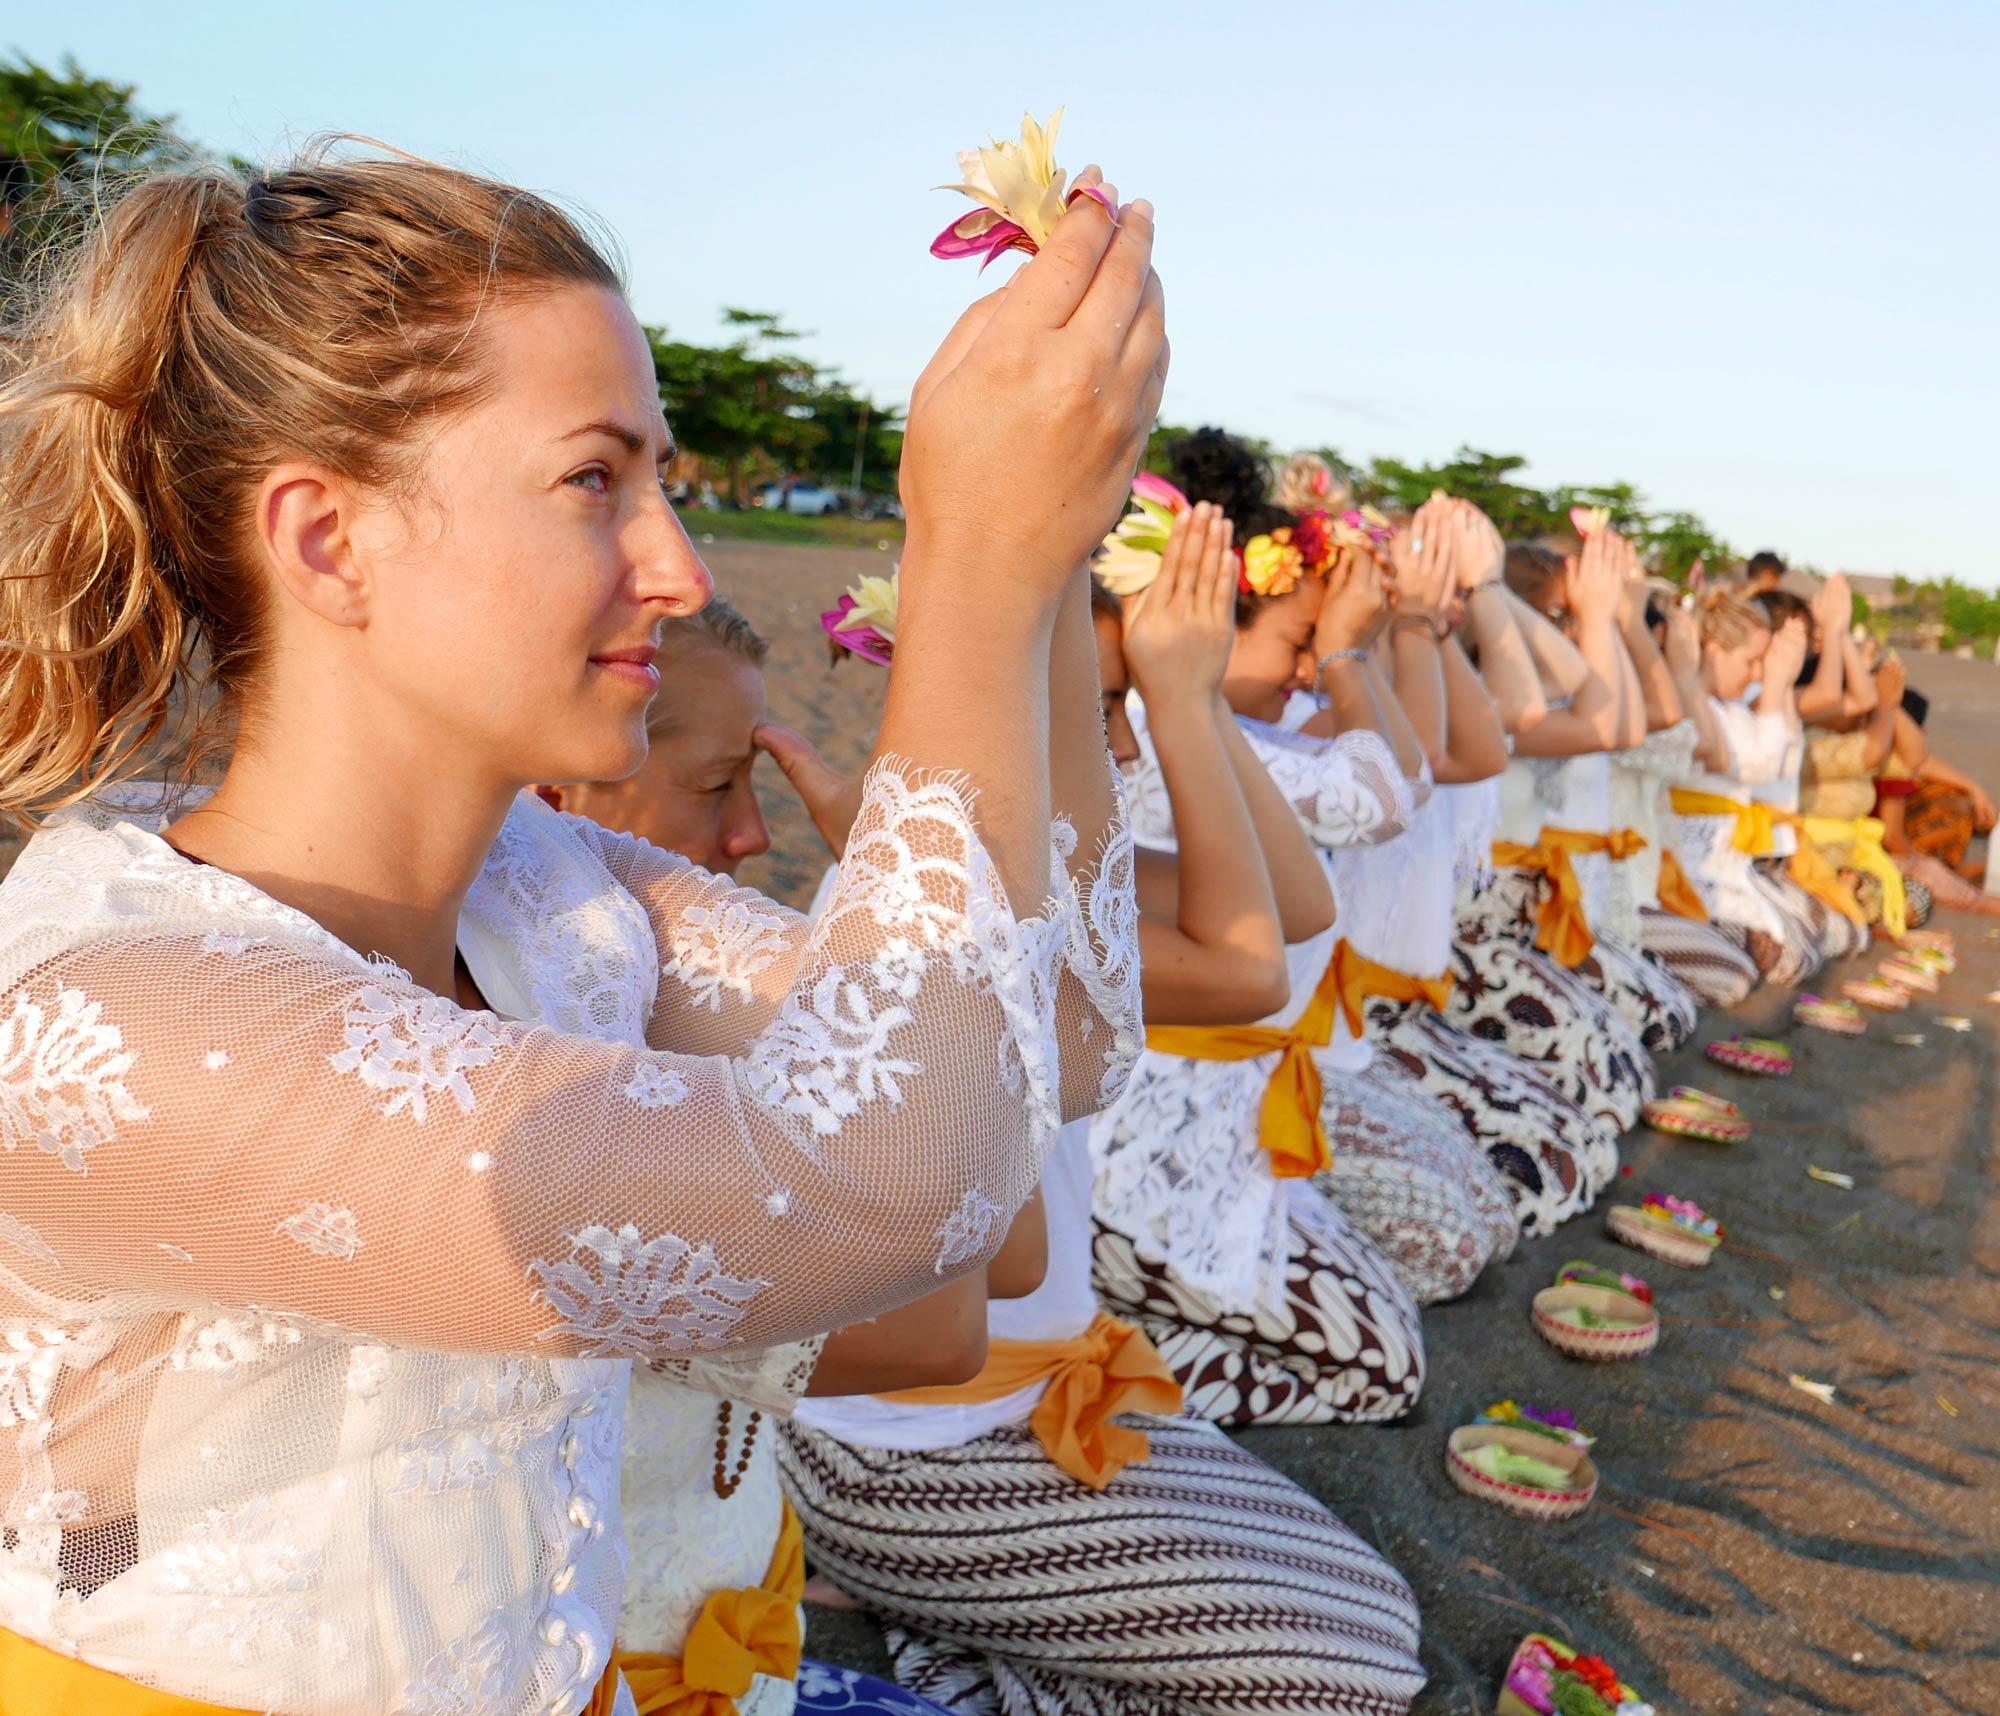 kula-collective-yoga-teacher-training-art-of-living-.jpg